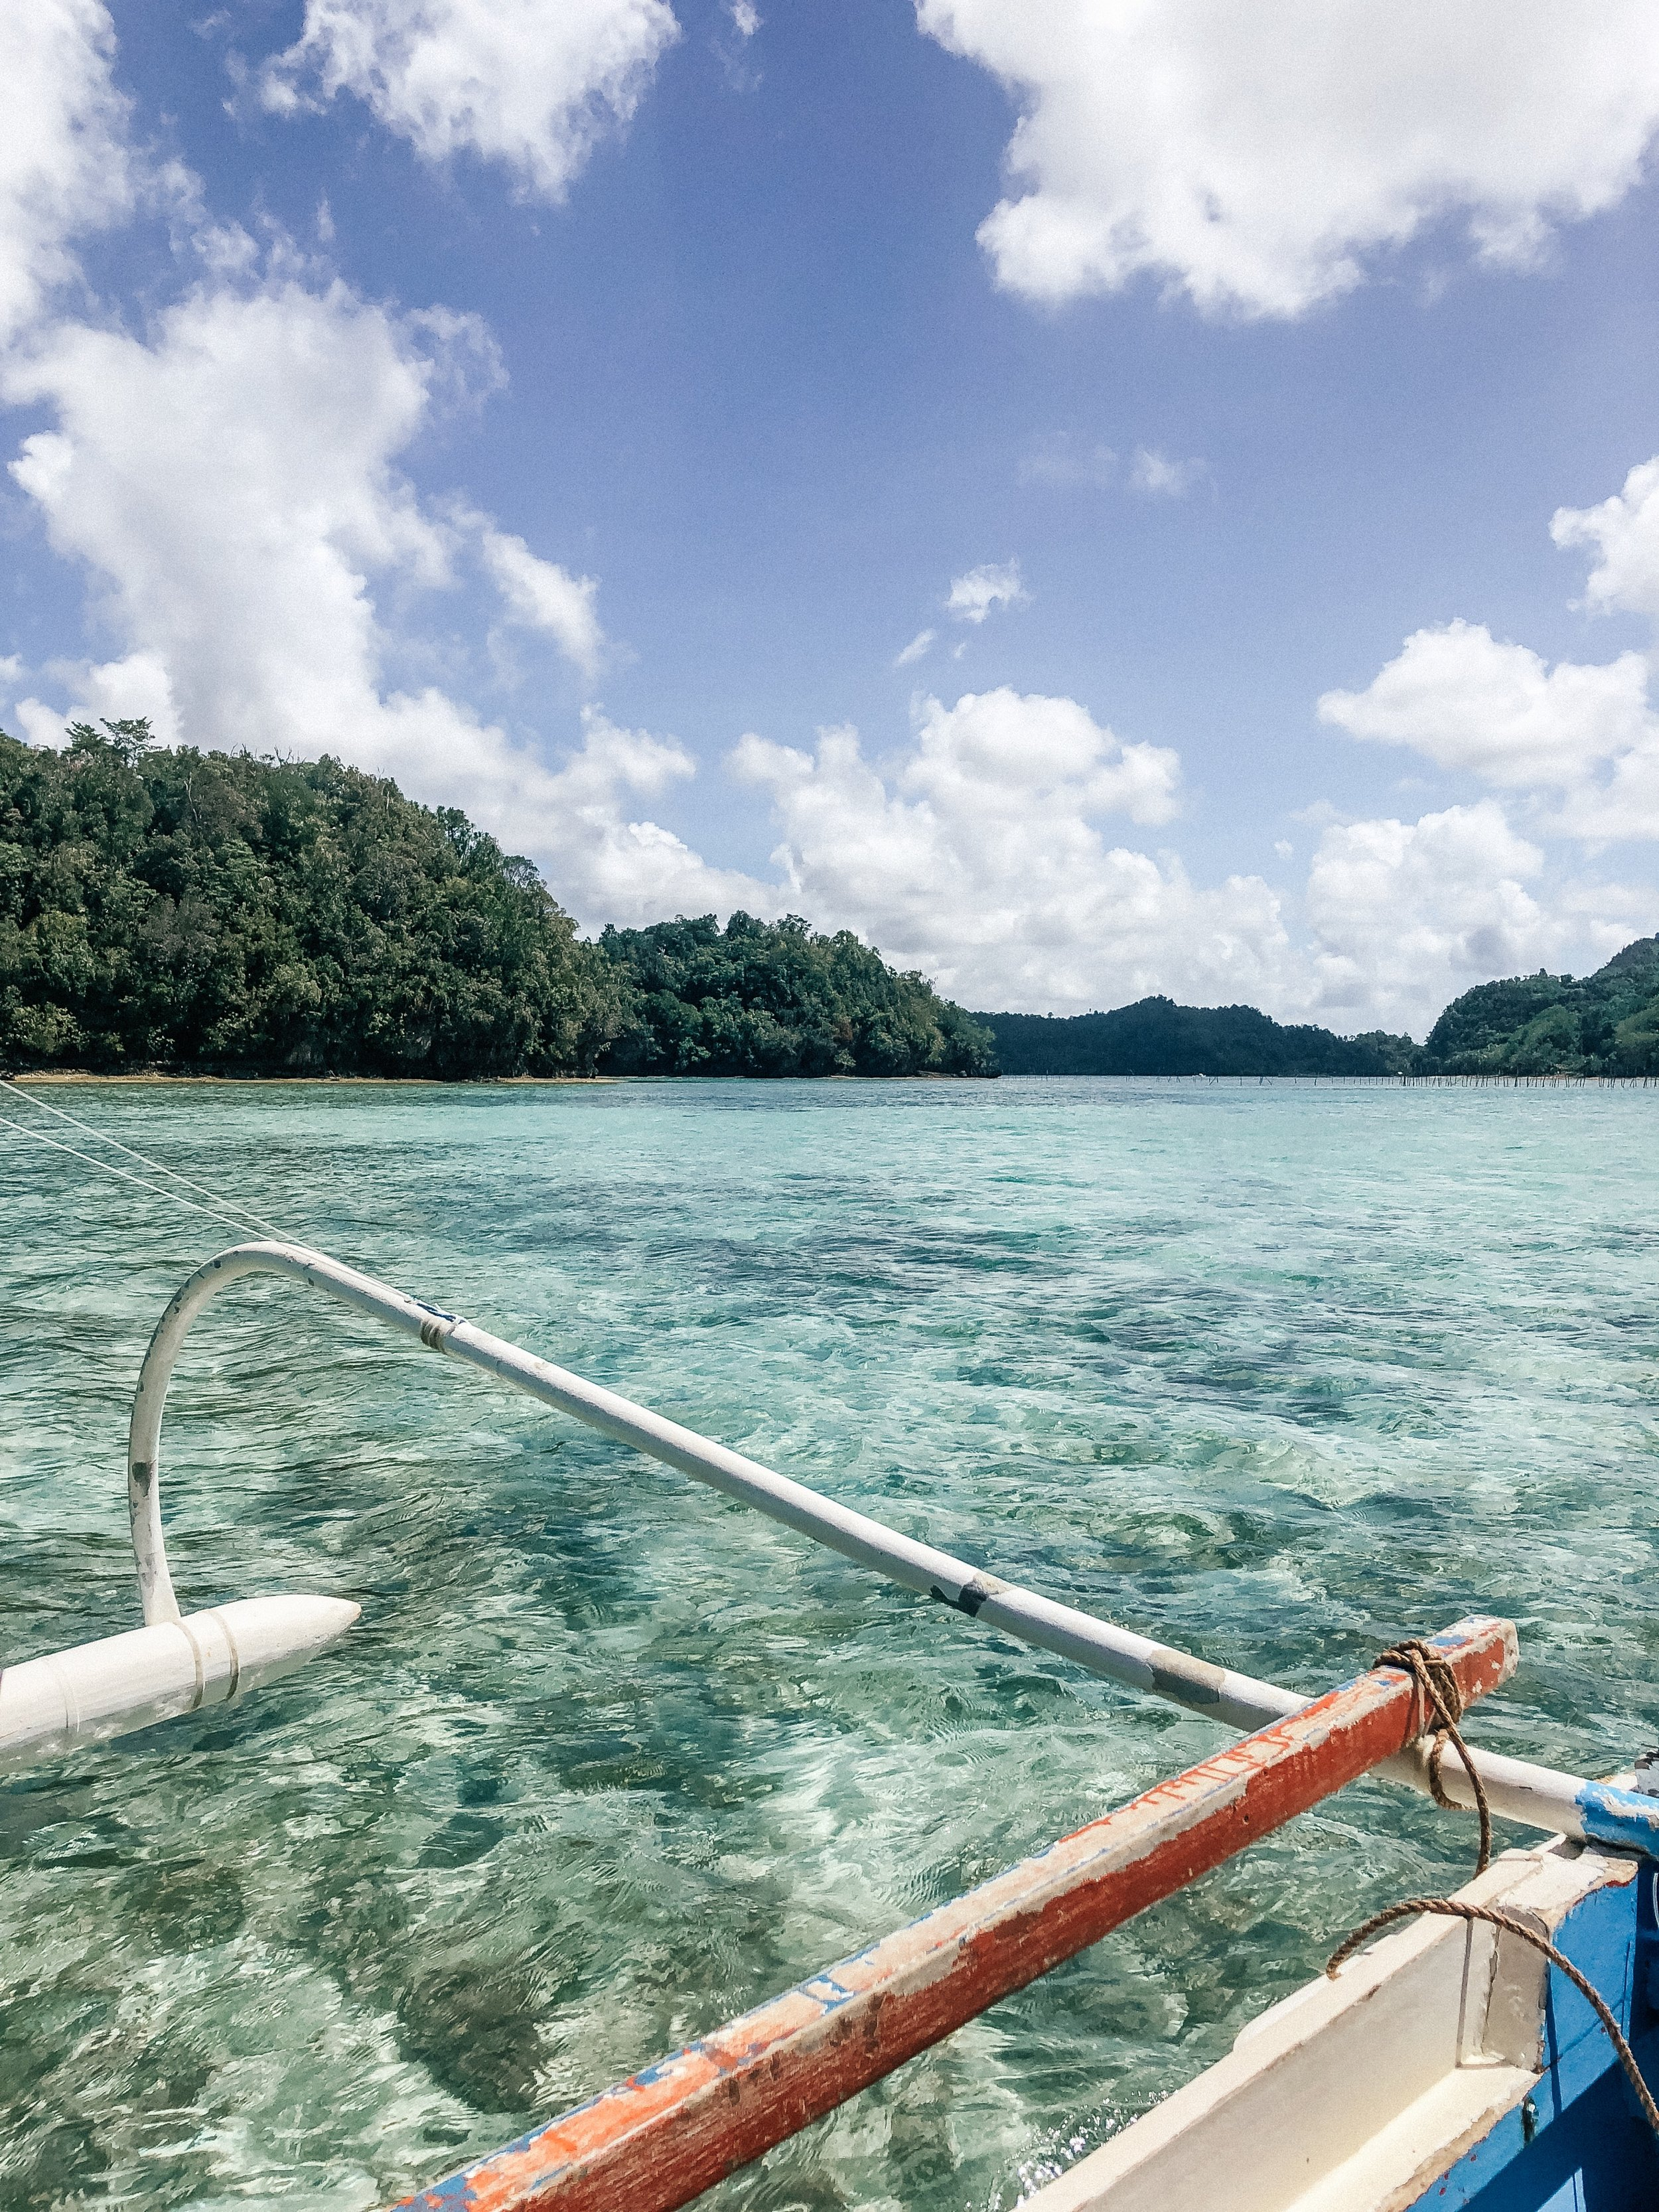 En Route to Sugba Lagoon, Siargao